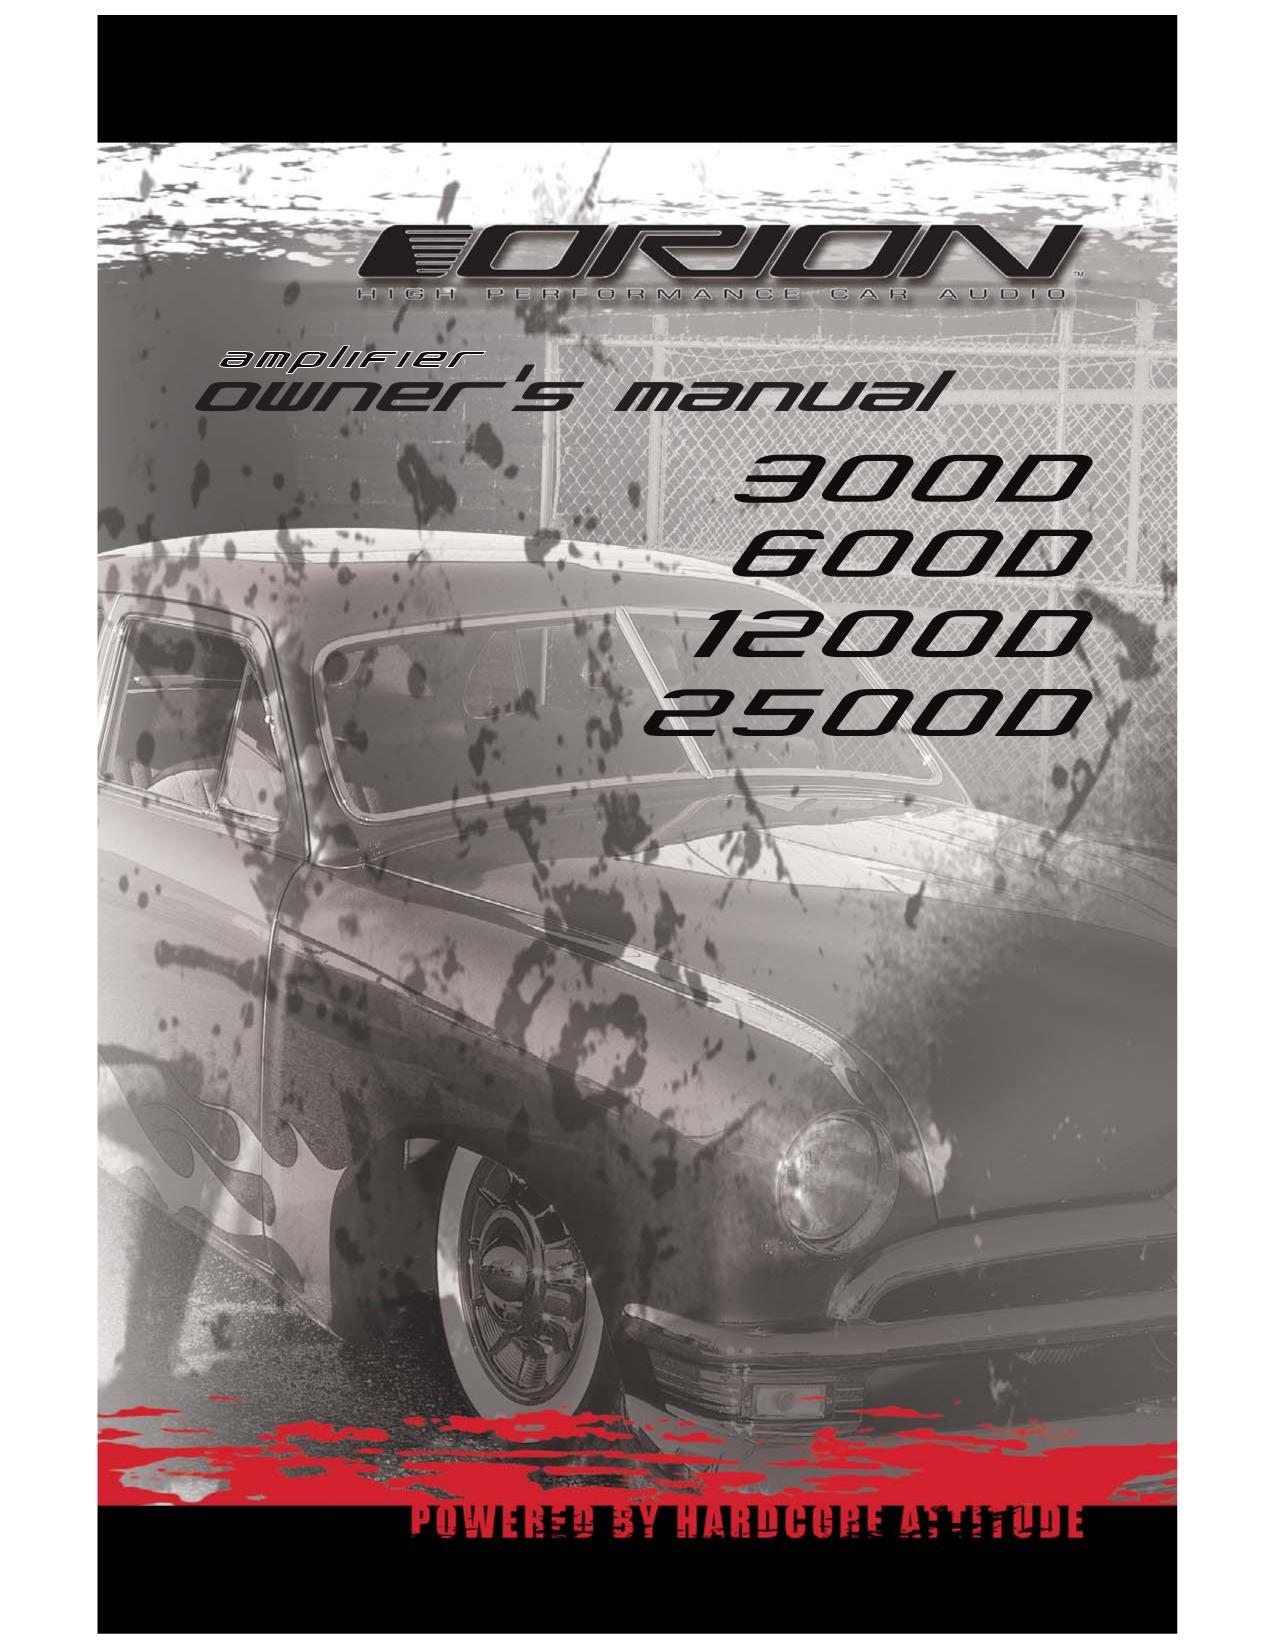 canon 300d manual pdf download